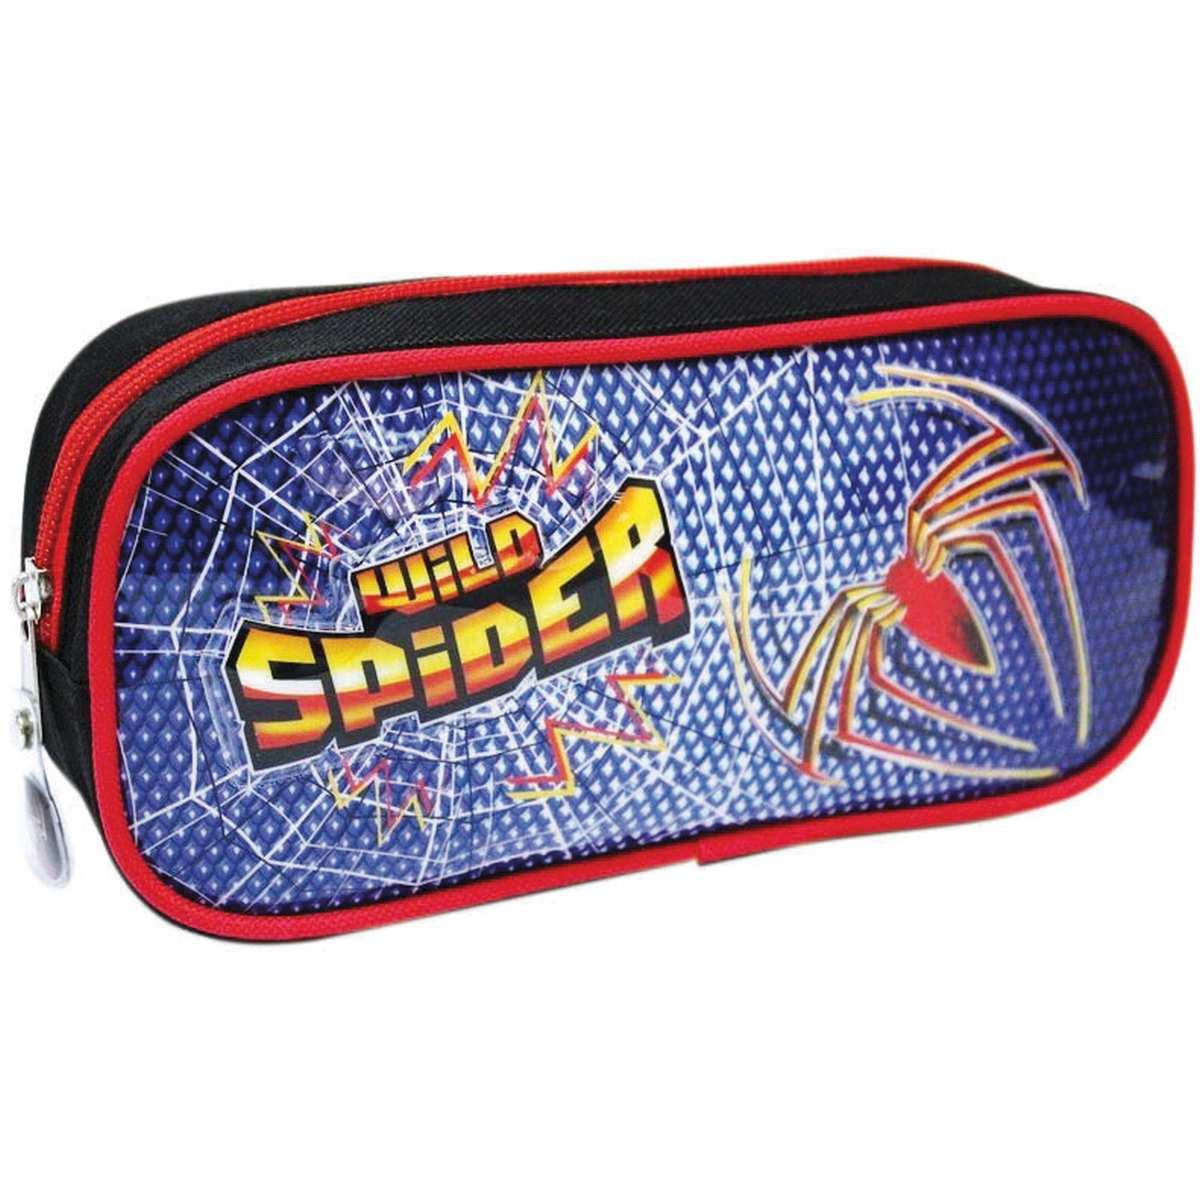 Estojo Tecido - Wild Spider GD 1 Ziper Sortidos - Kit